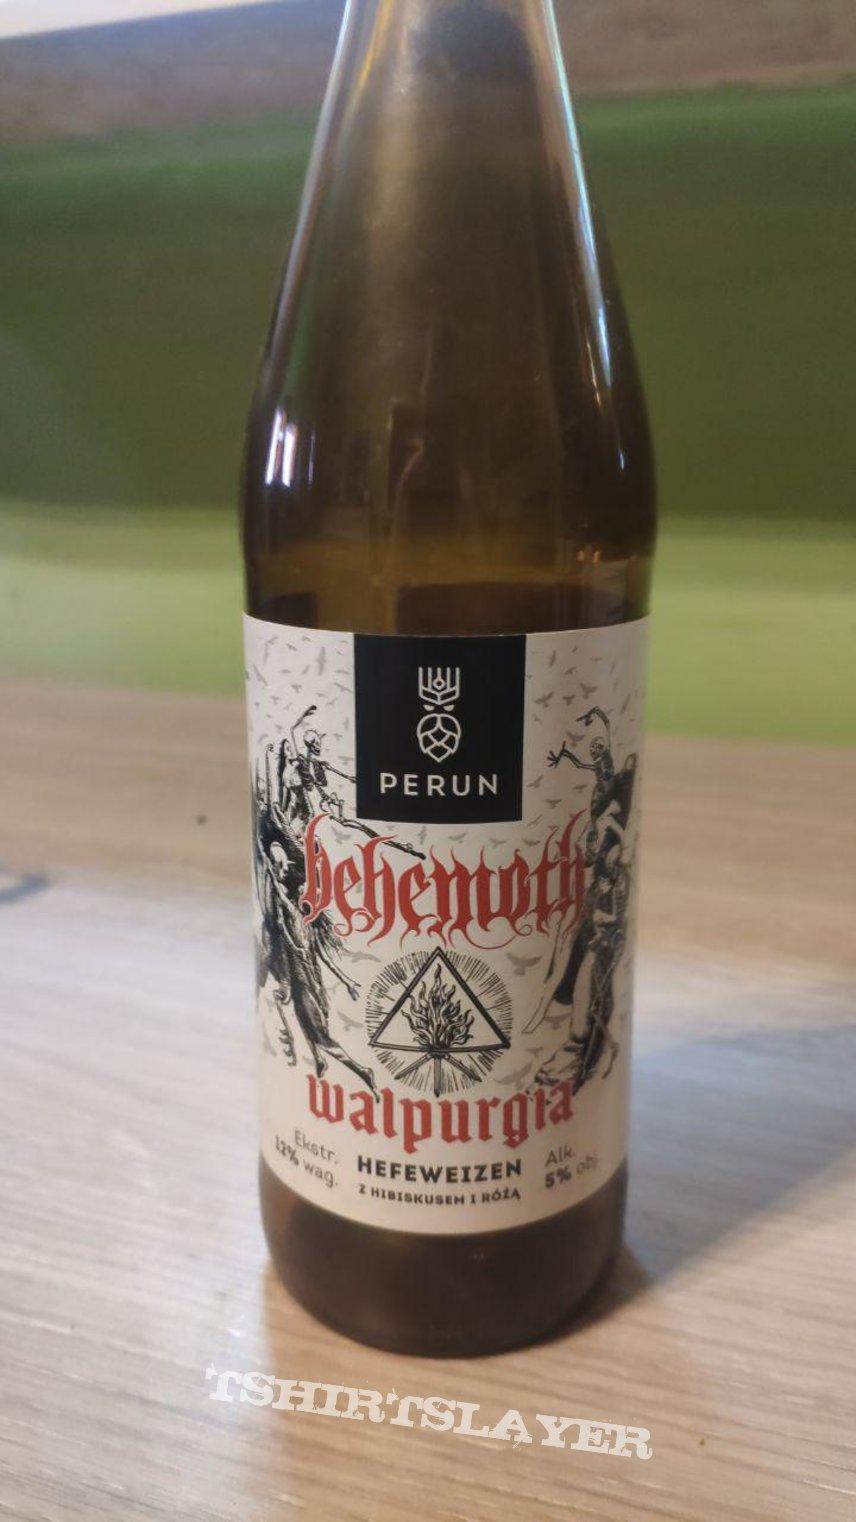 Behemoth - Walpurgia (Beer from Browar Perun)